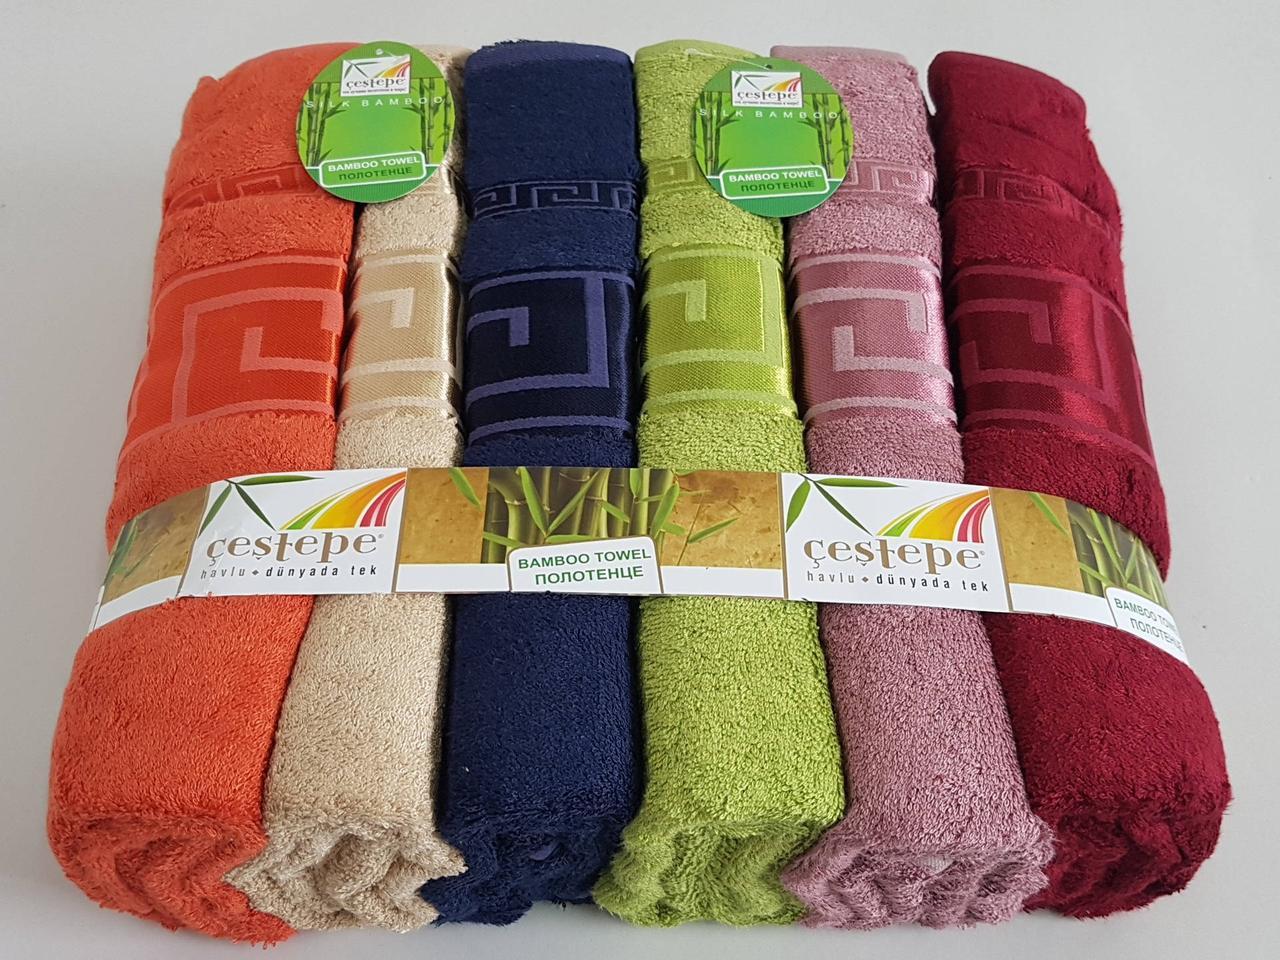 Бамбуковые банные полотенца «Cestepe Grek» Турция  (6 шт)